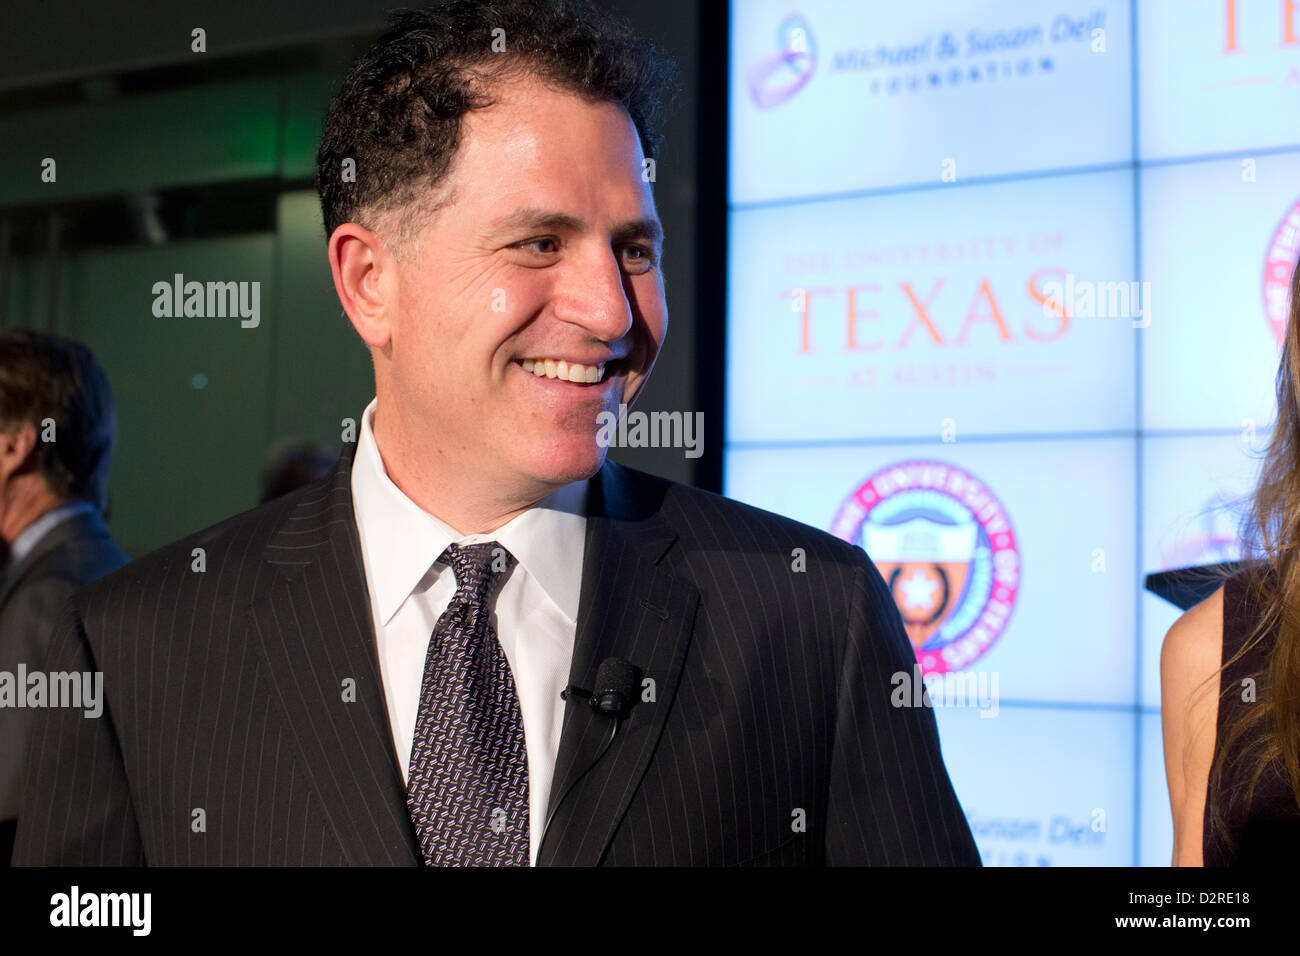 Dell Computer CEO Michael Dell announces donation of $50 million to help create Dell Medical School in Austin TX - Stock Image